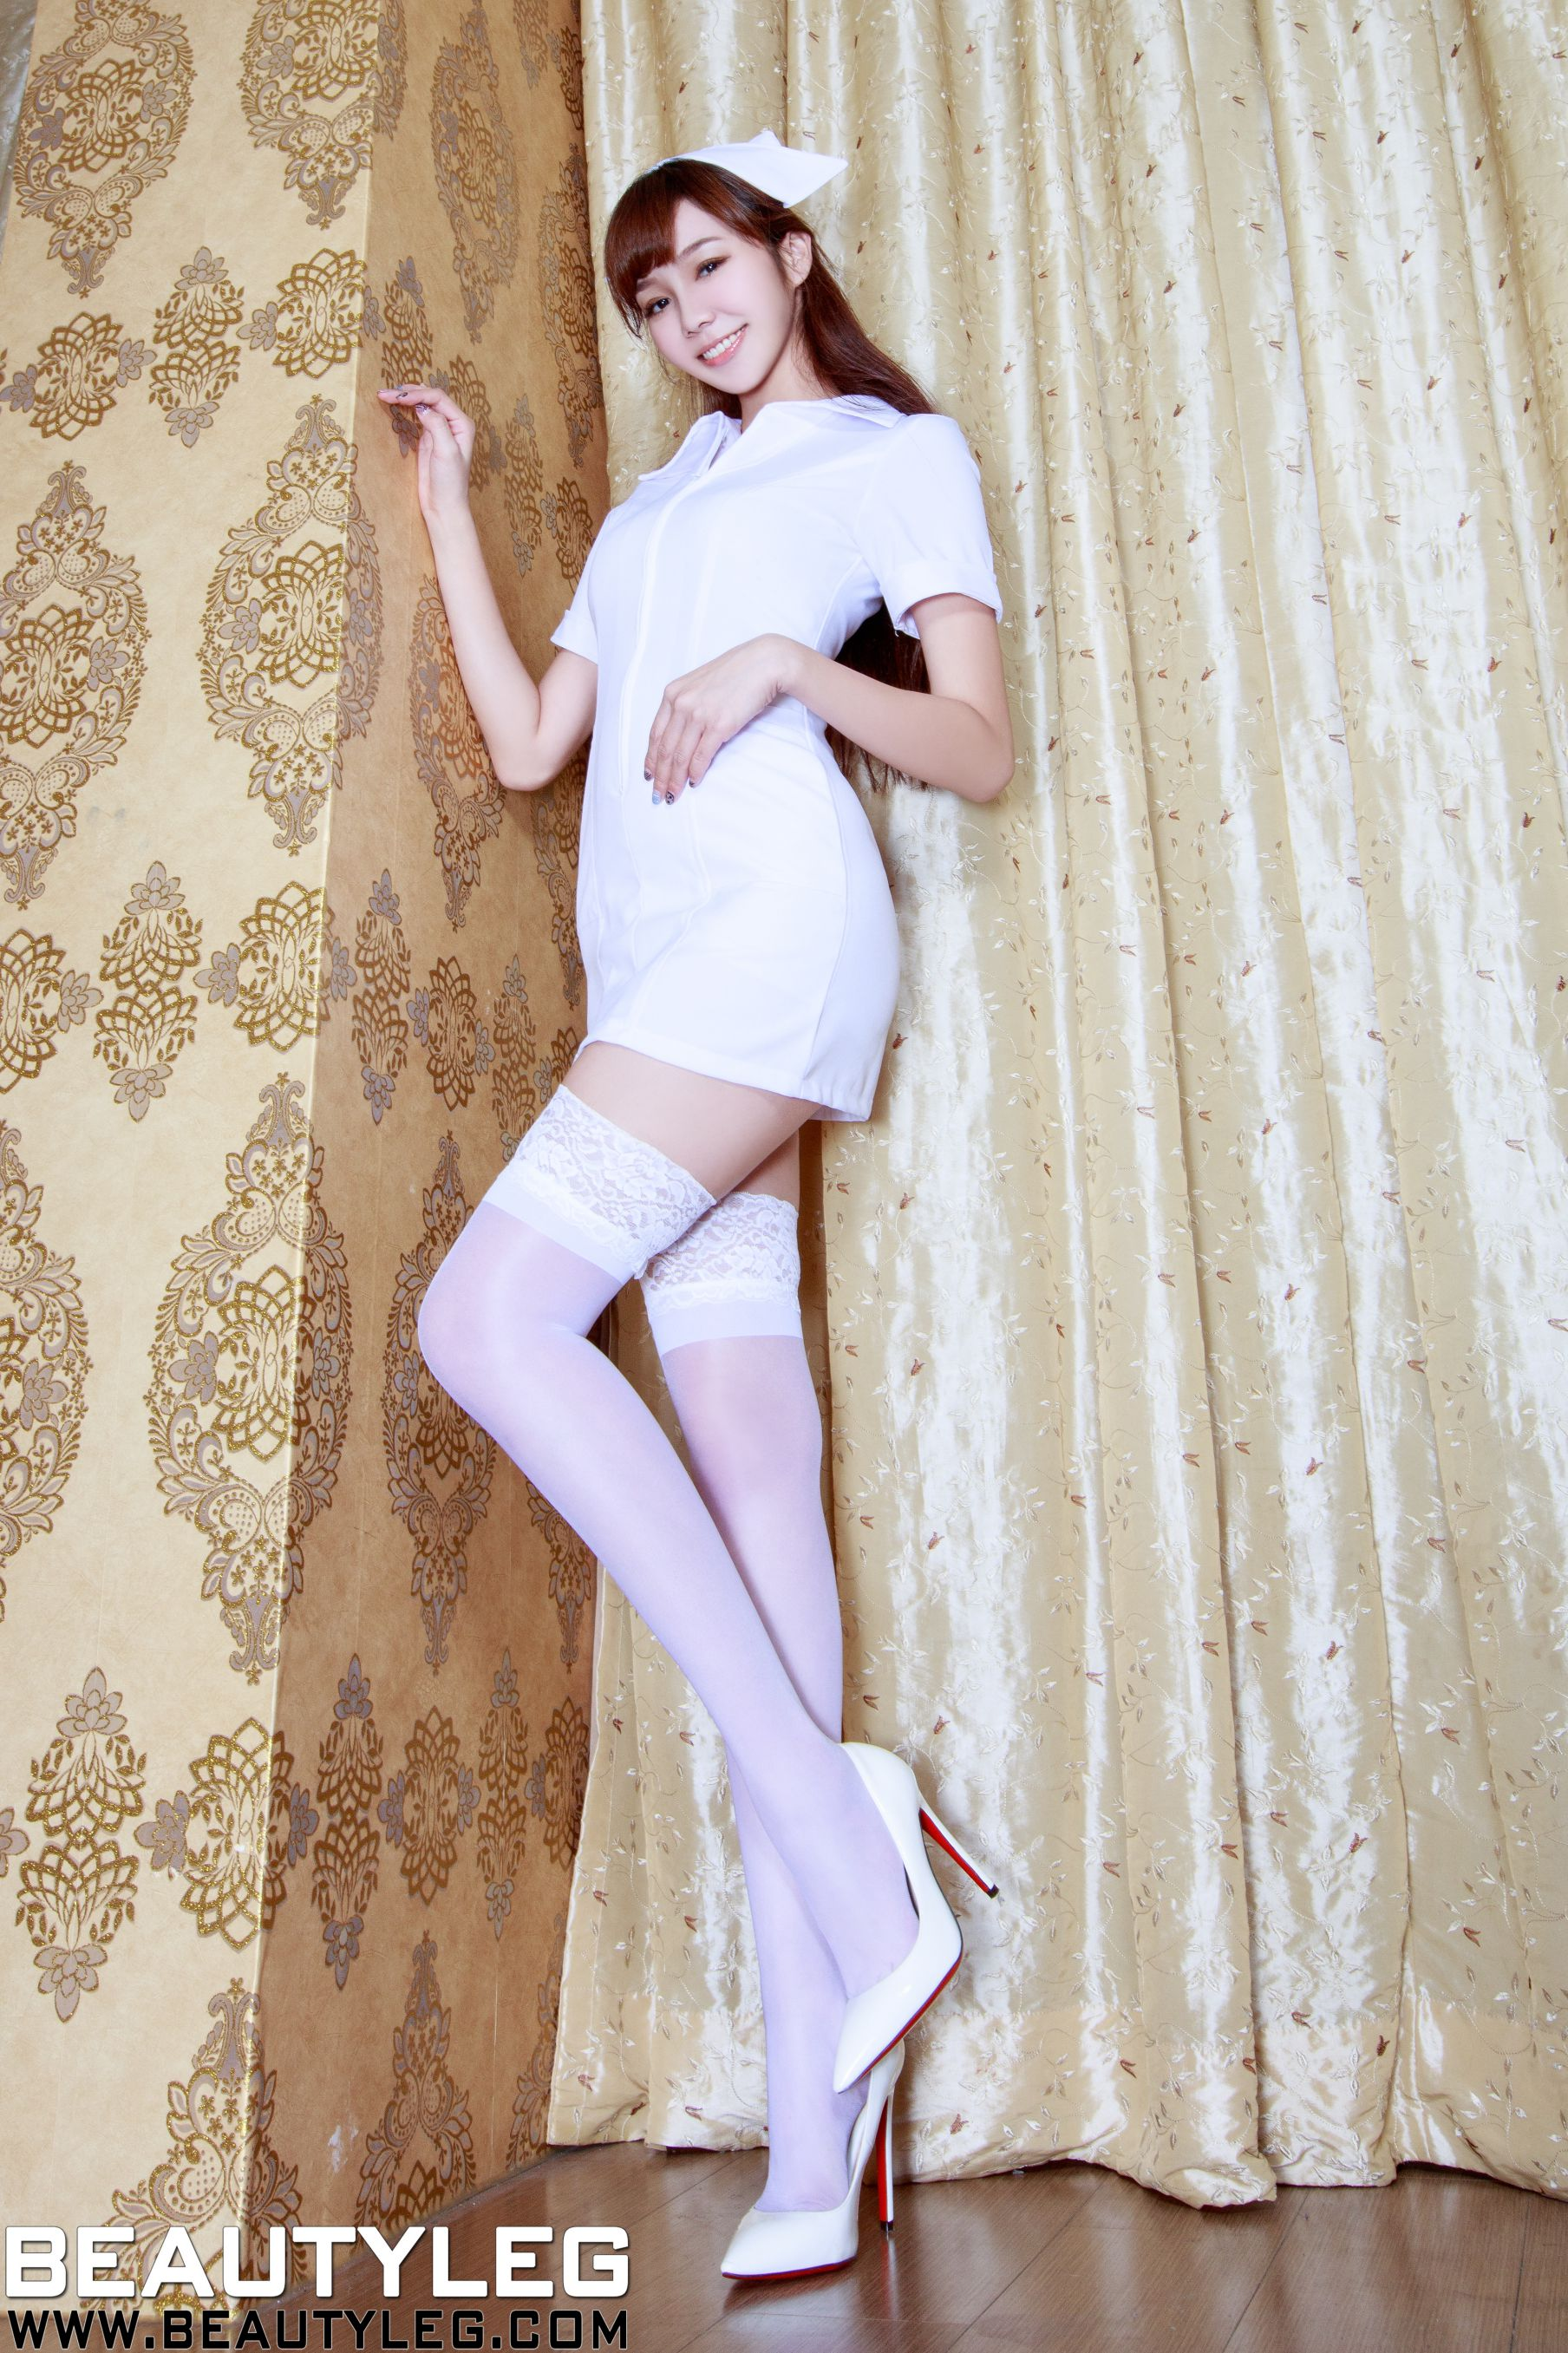 VOL.1604 [Beautyleg]高跟美腿:陈蕴予(腿模Tammy,小予儿)高品质写真套图(53P)